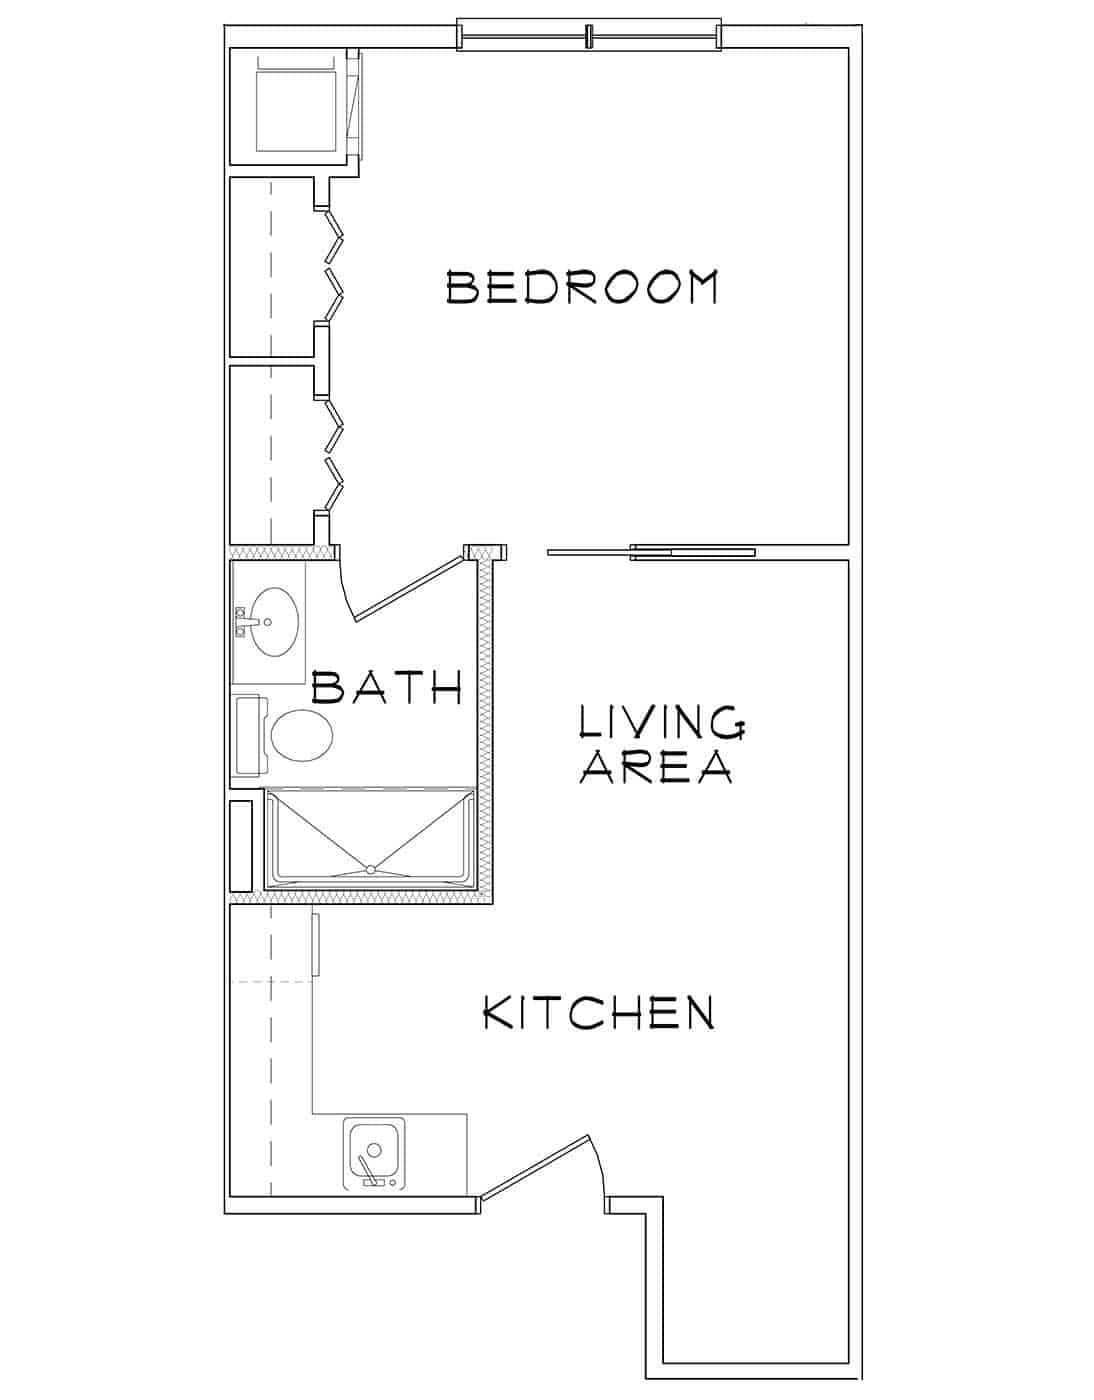 Calico – 1BR/1BA – 465 sq. ft.